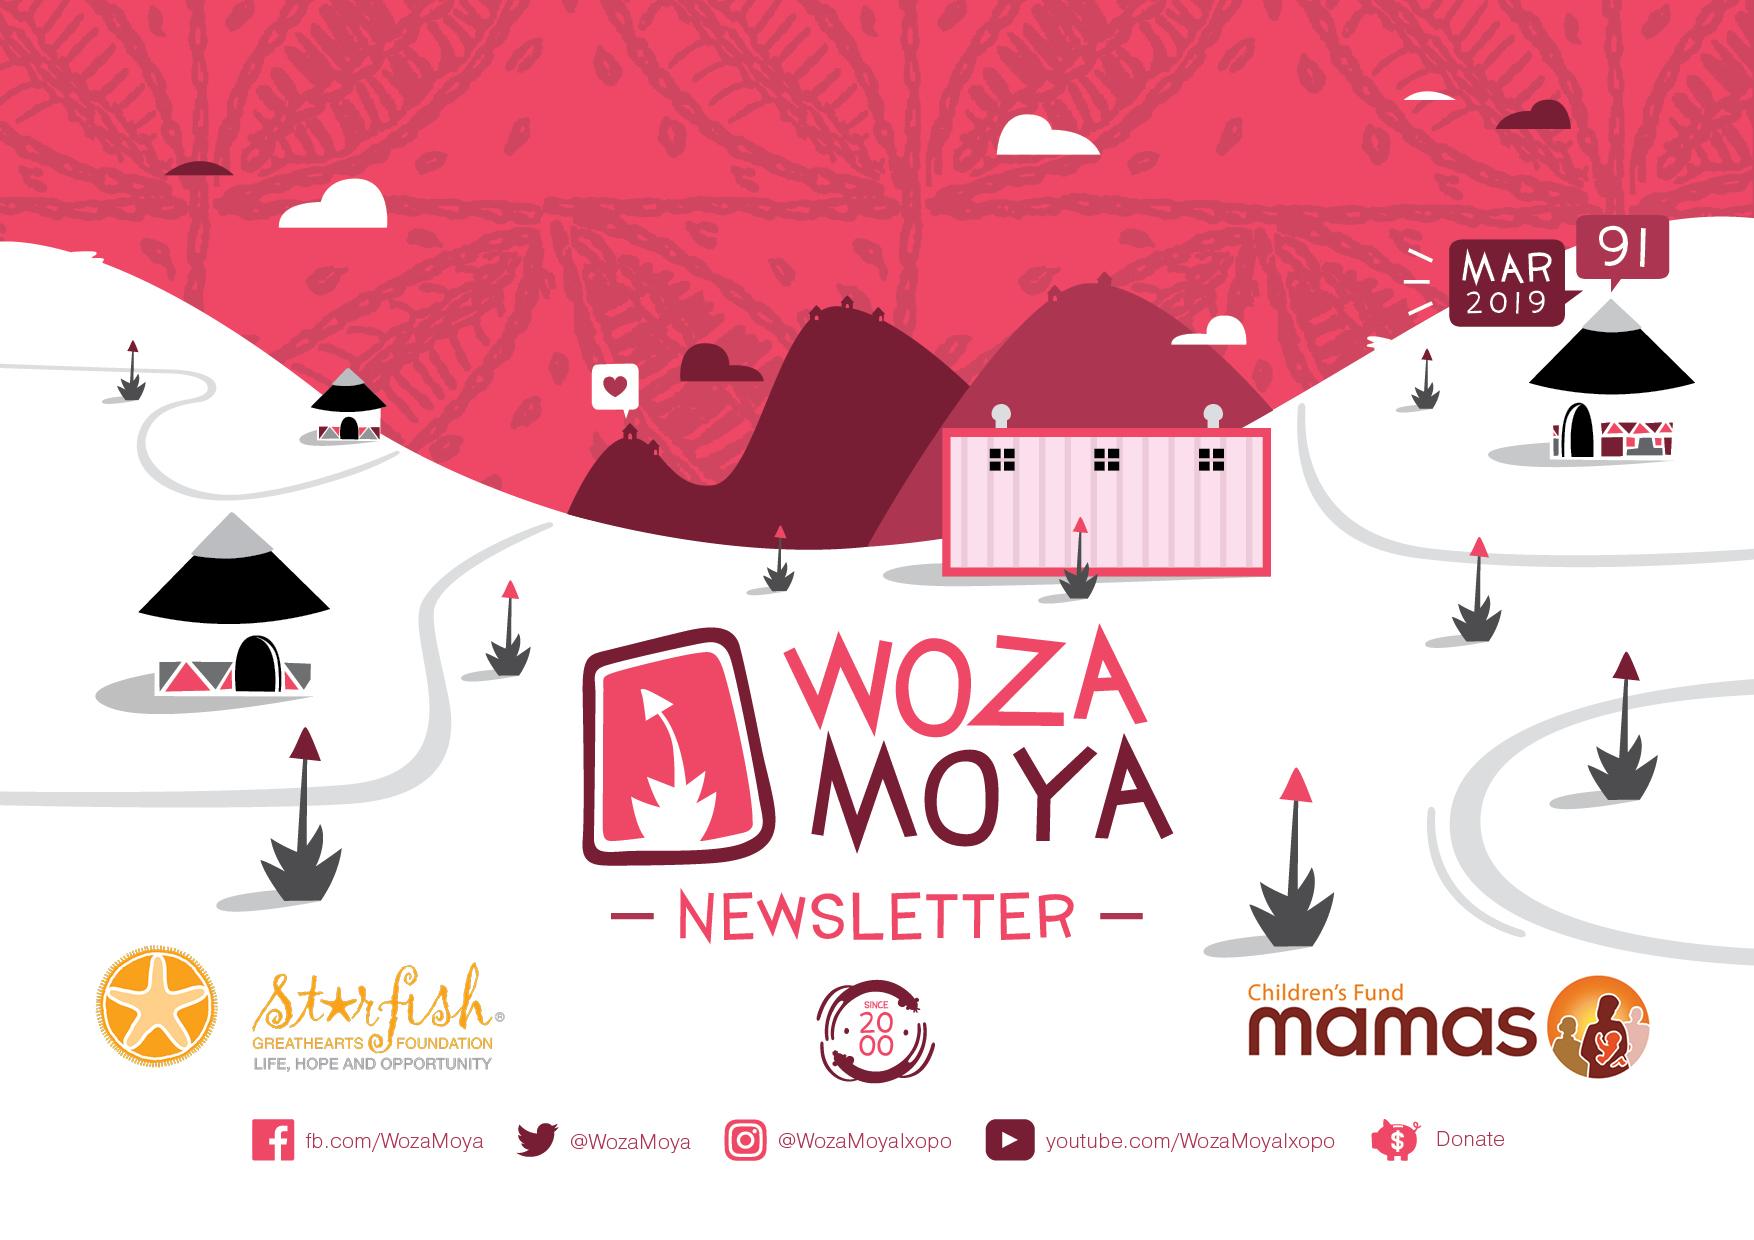 WozaMoya_Newsletter_91.jpg